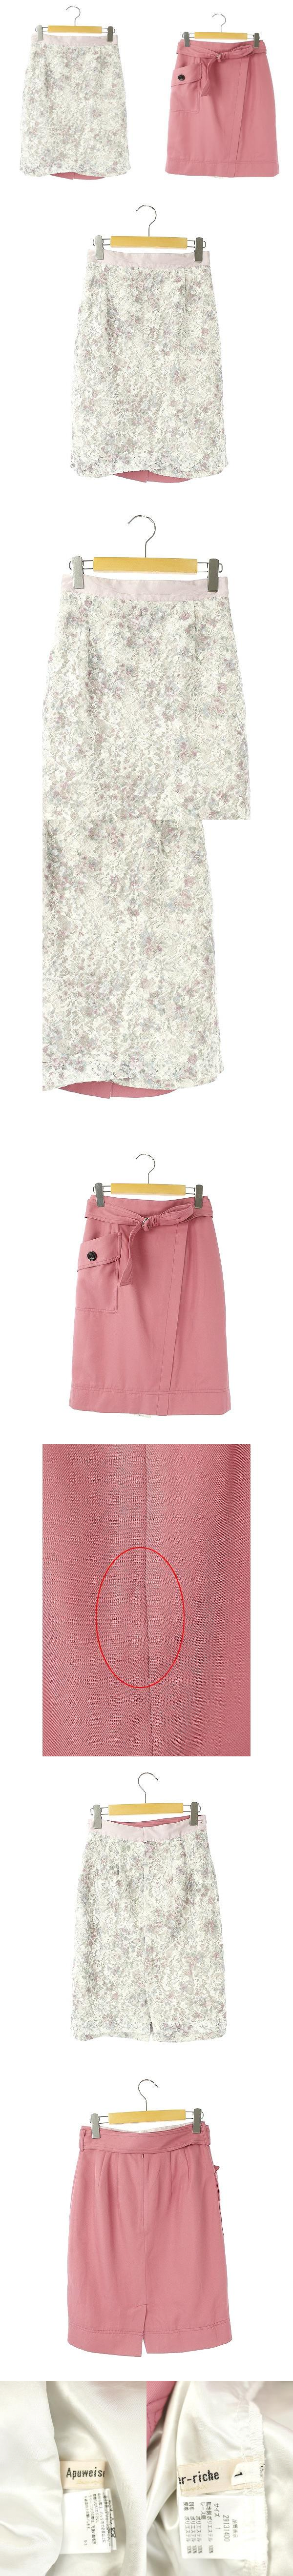 19SS レースプリントリバーシブルスカート 膝丈 1 ピンク 薄紫 白 /AO ■OS